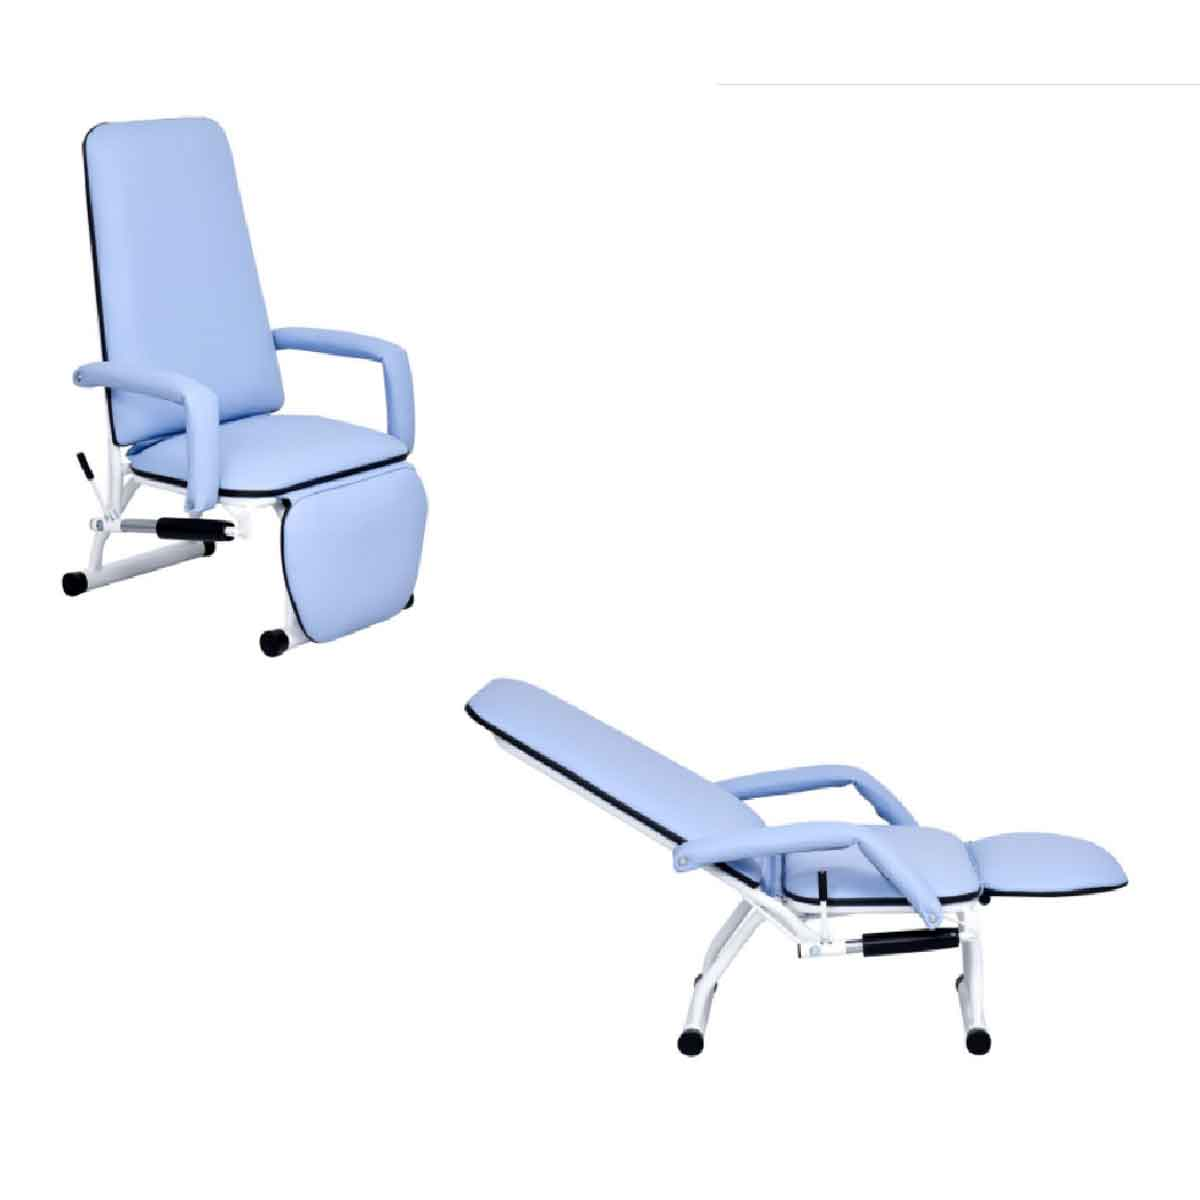 Poltrona reclinável modelo LUXO